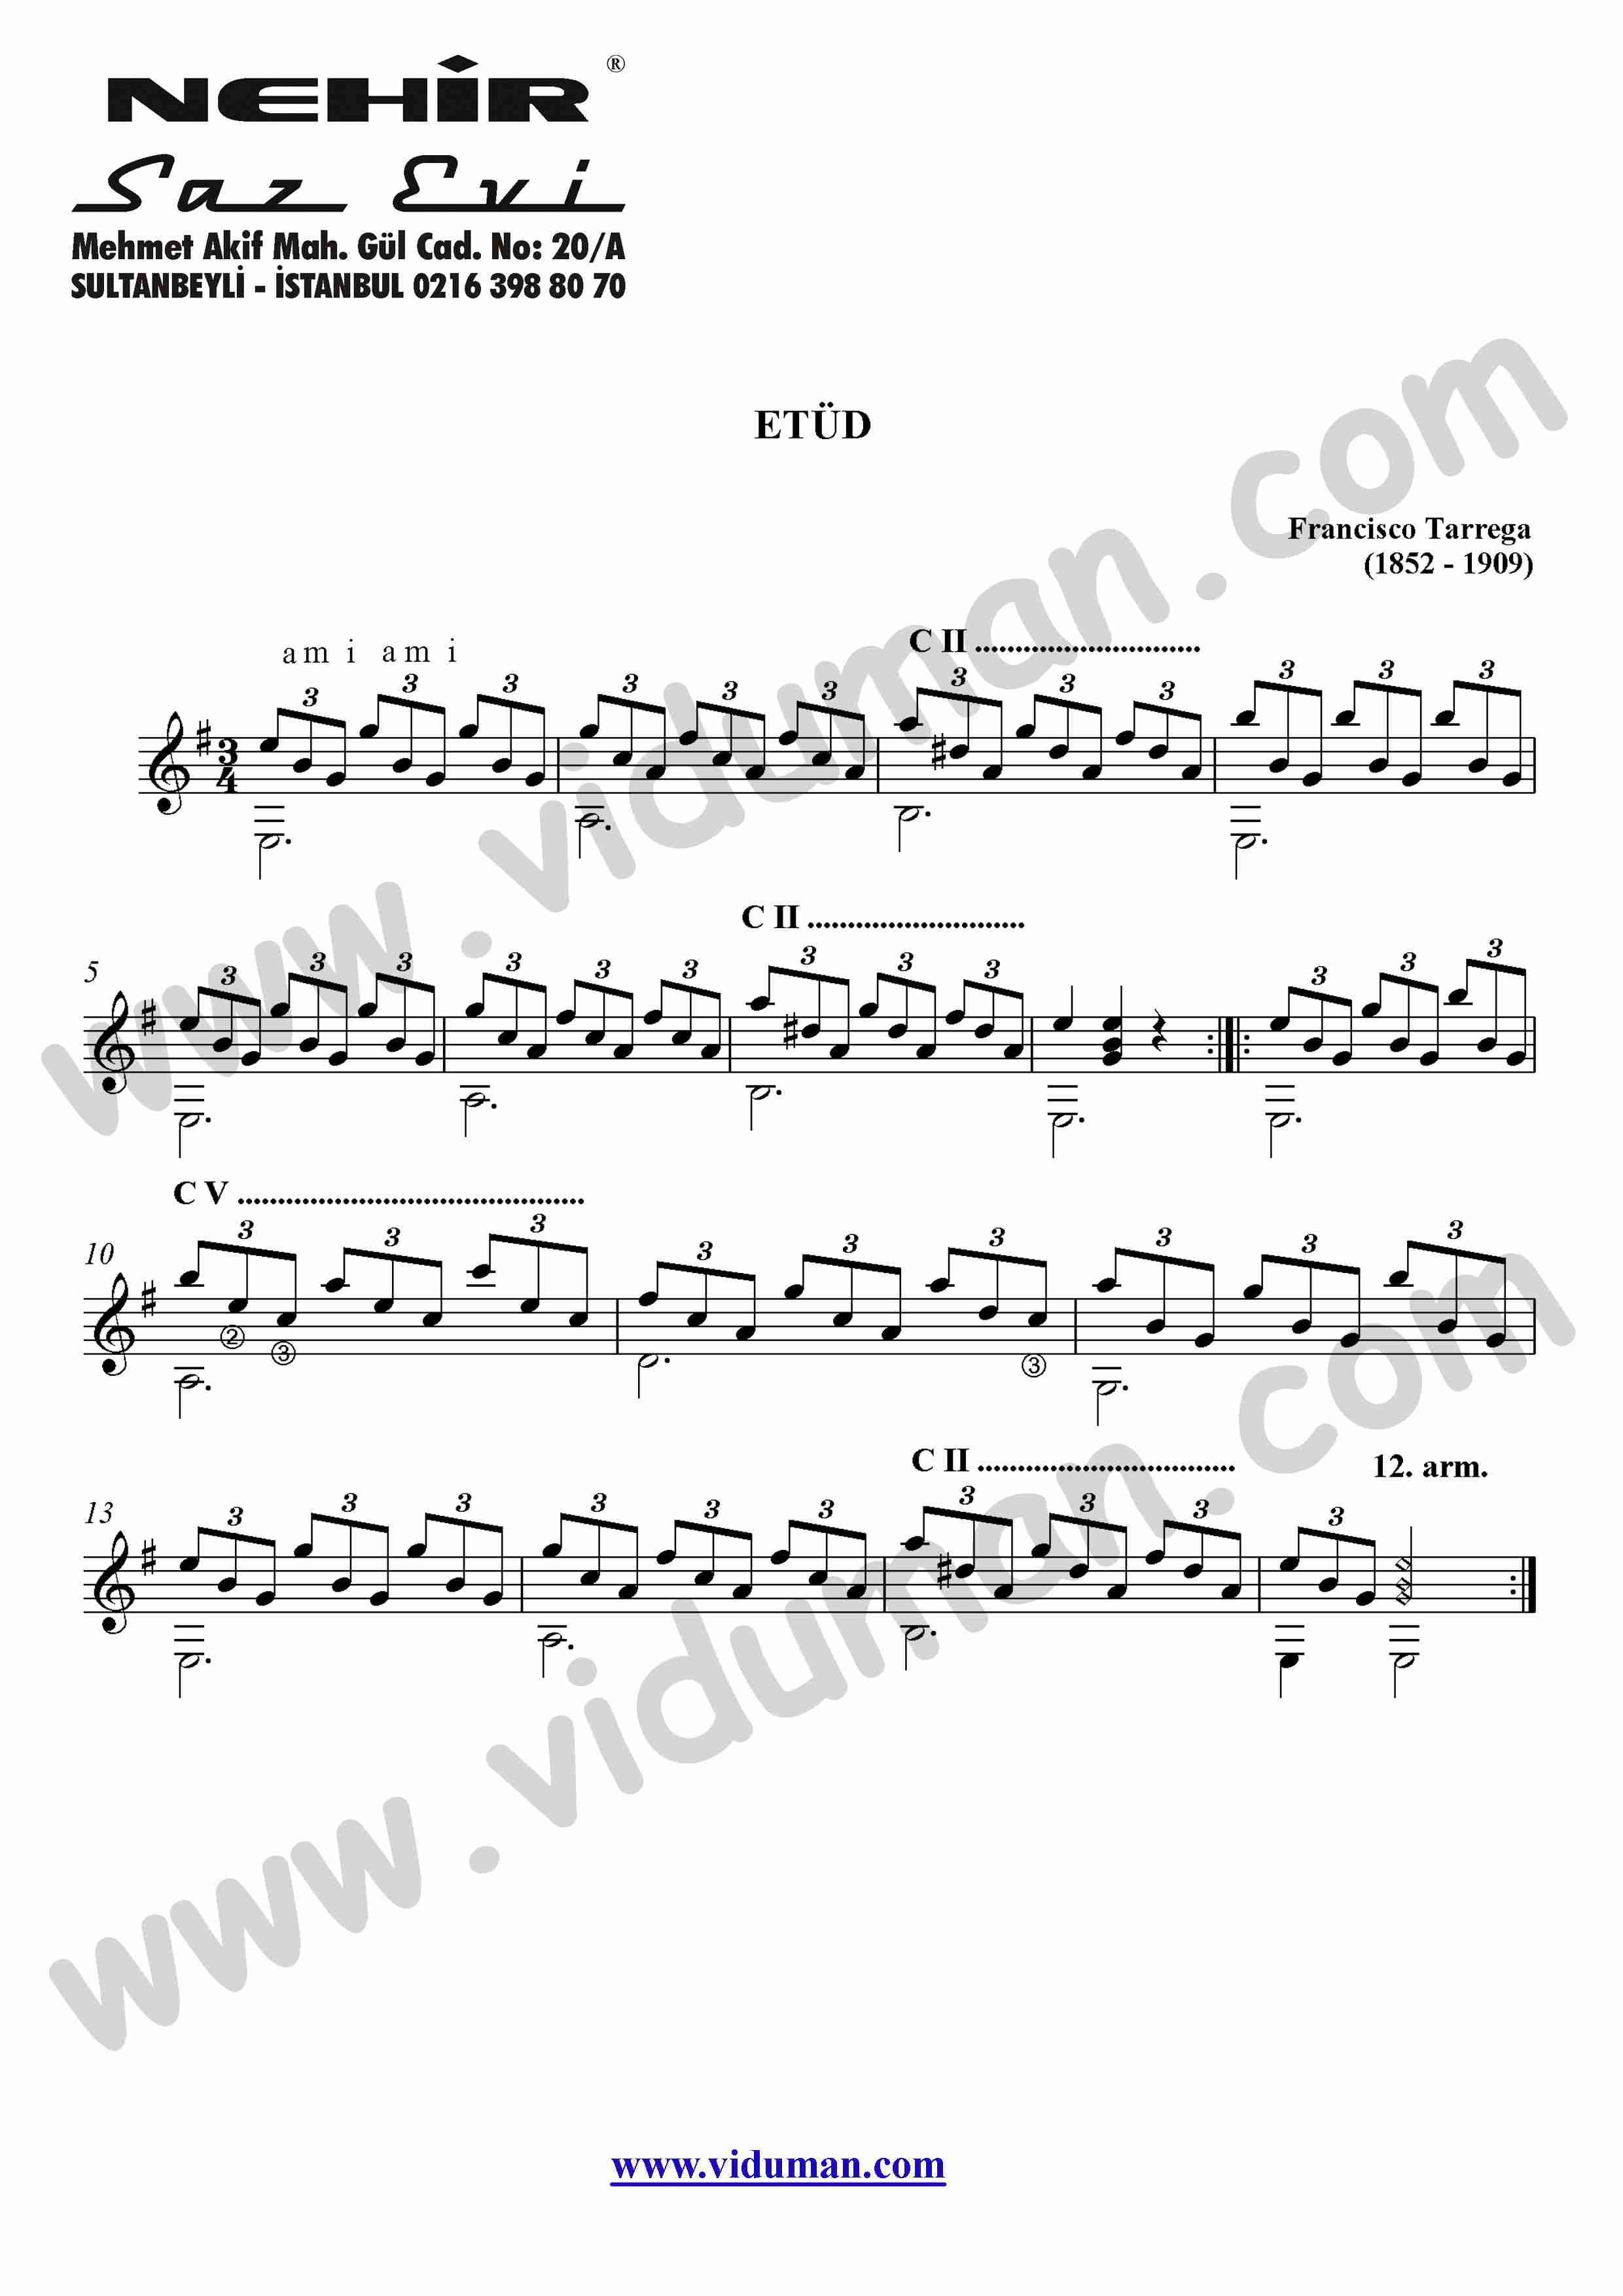 31- Study In Mi Minor Etud (Francisco Tarrega)